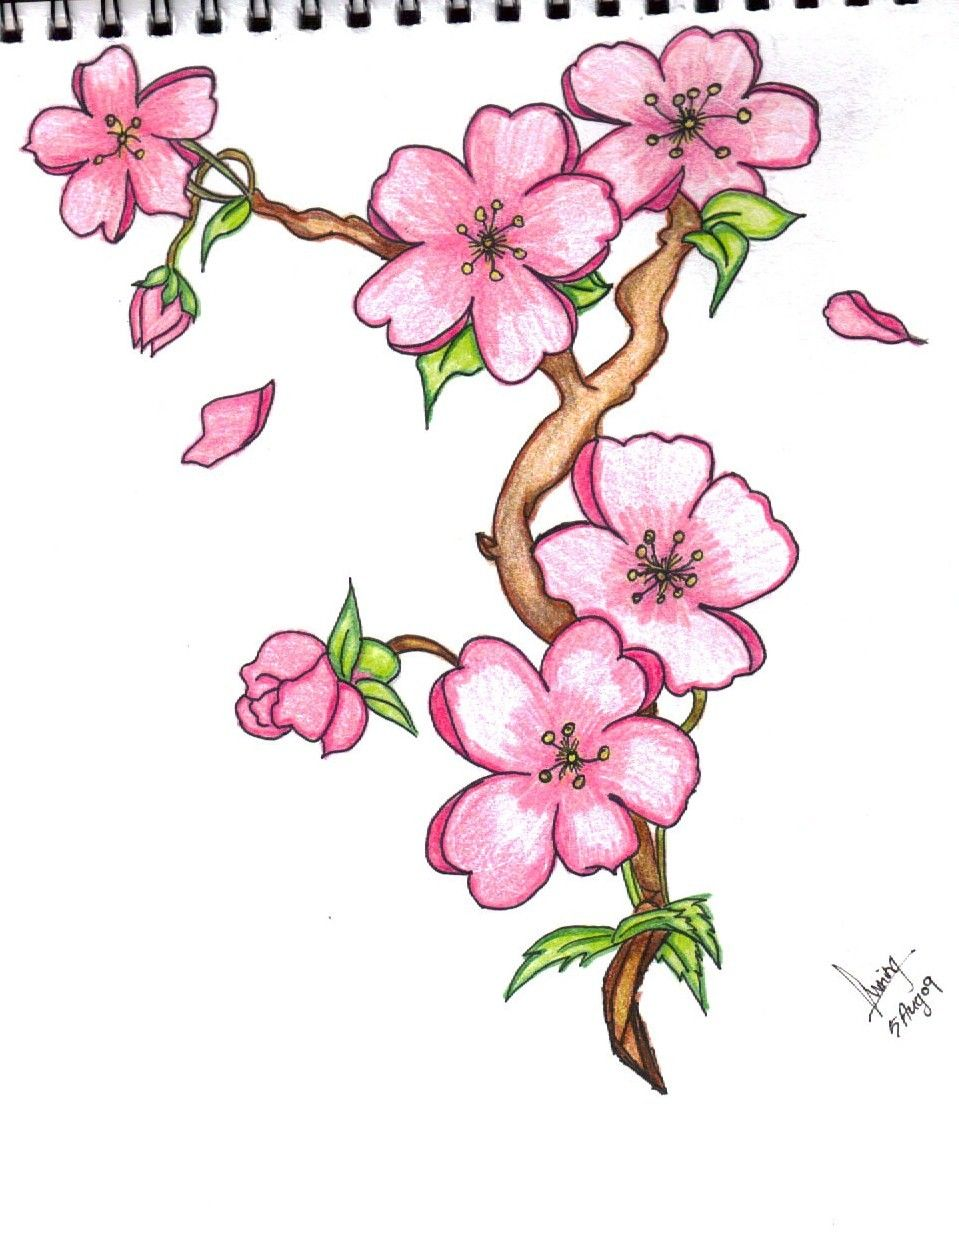 959x1242 Flower Drawings A Beautiful Flower Always Makes Us Smile Imagine